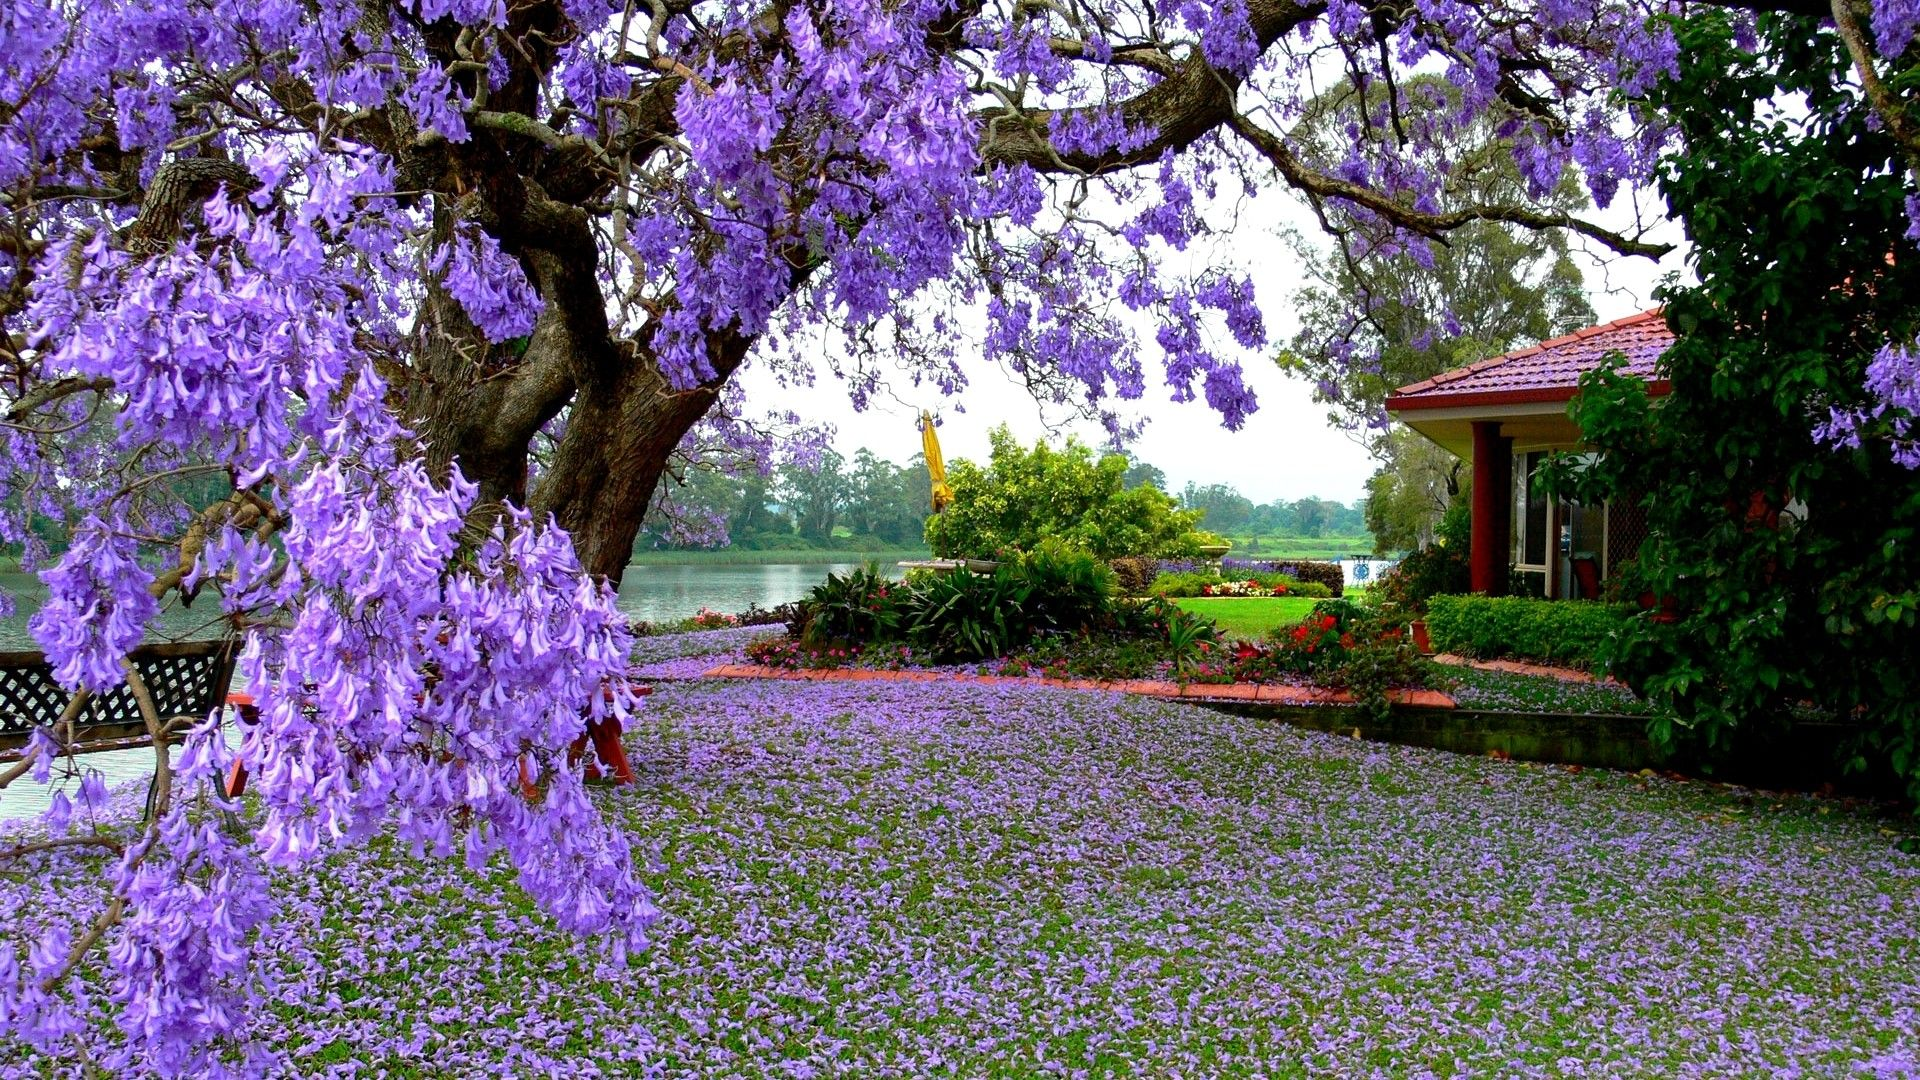 Spring Nature Desktop Backgrounds 2020 Live Wallpaper Hd Jacaranda Tree Flowering Trees Spring Wallpaper